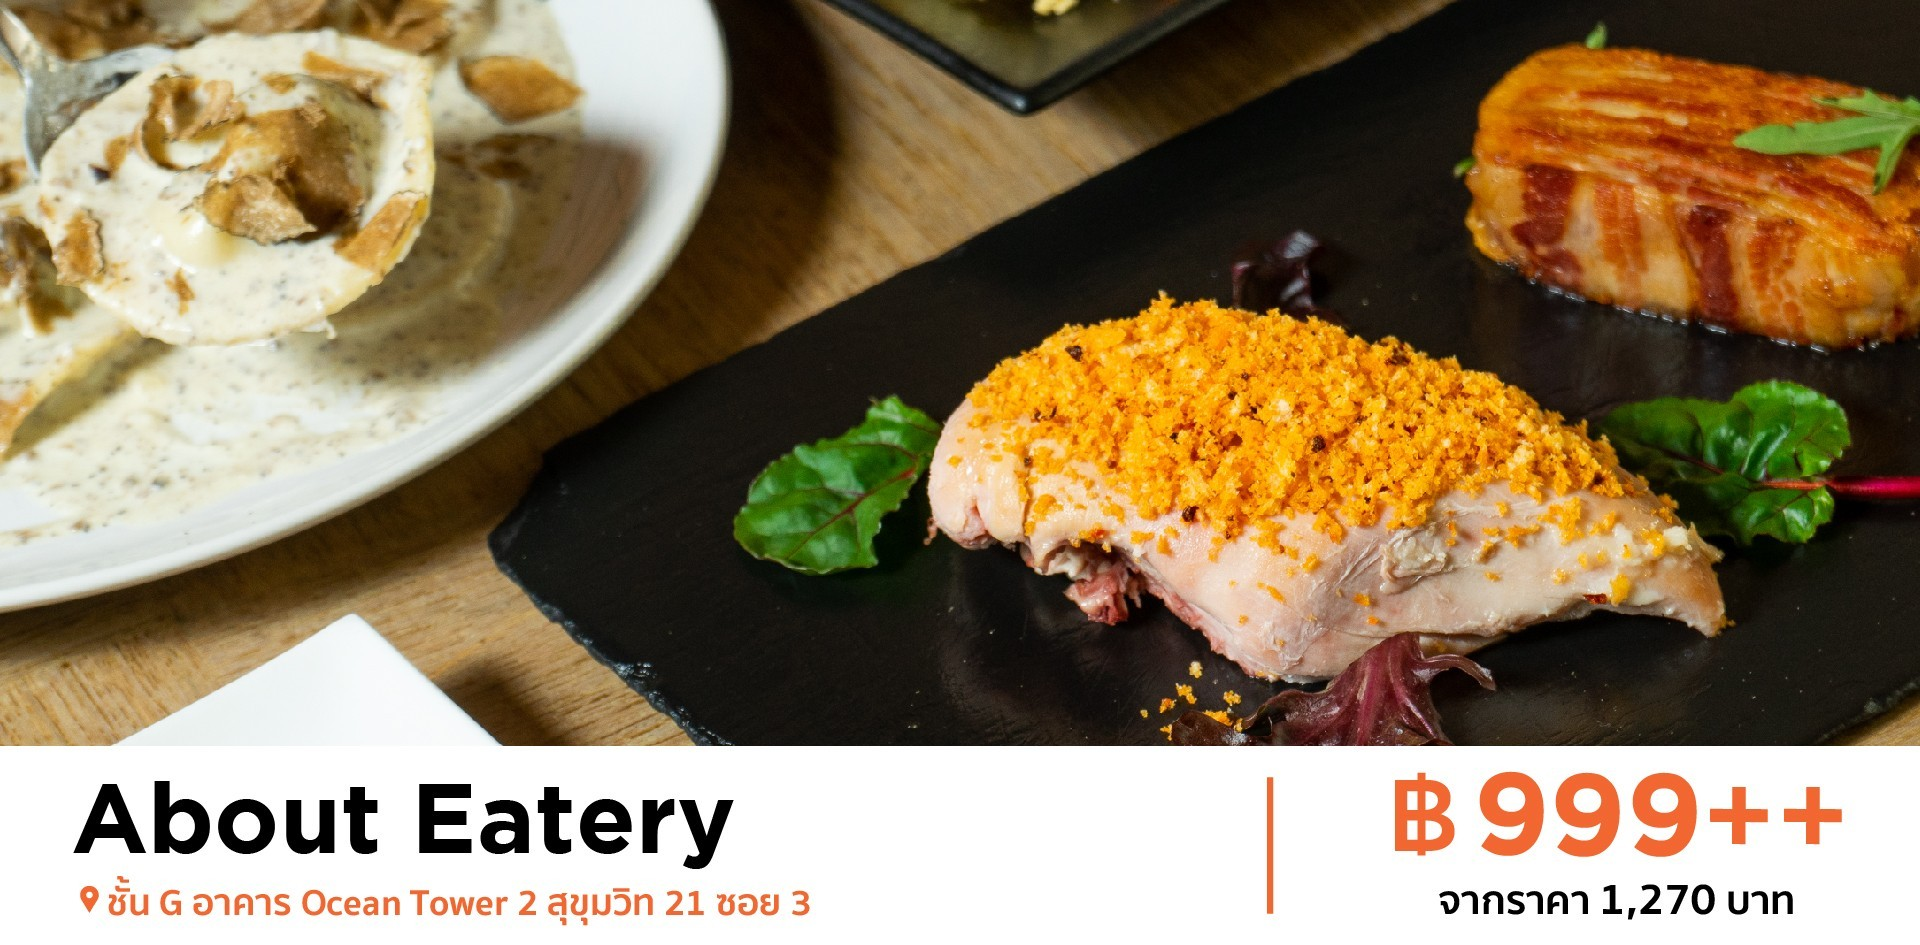 About Eatery (อะเบาท์อีเตอรี่)